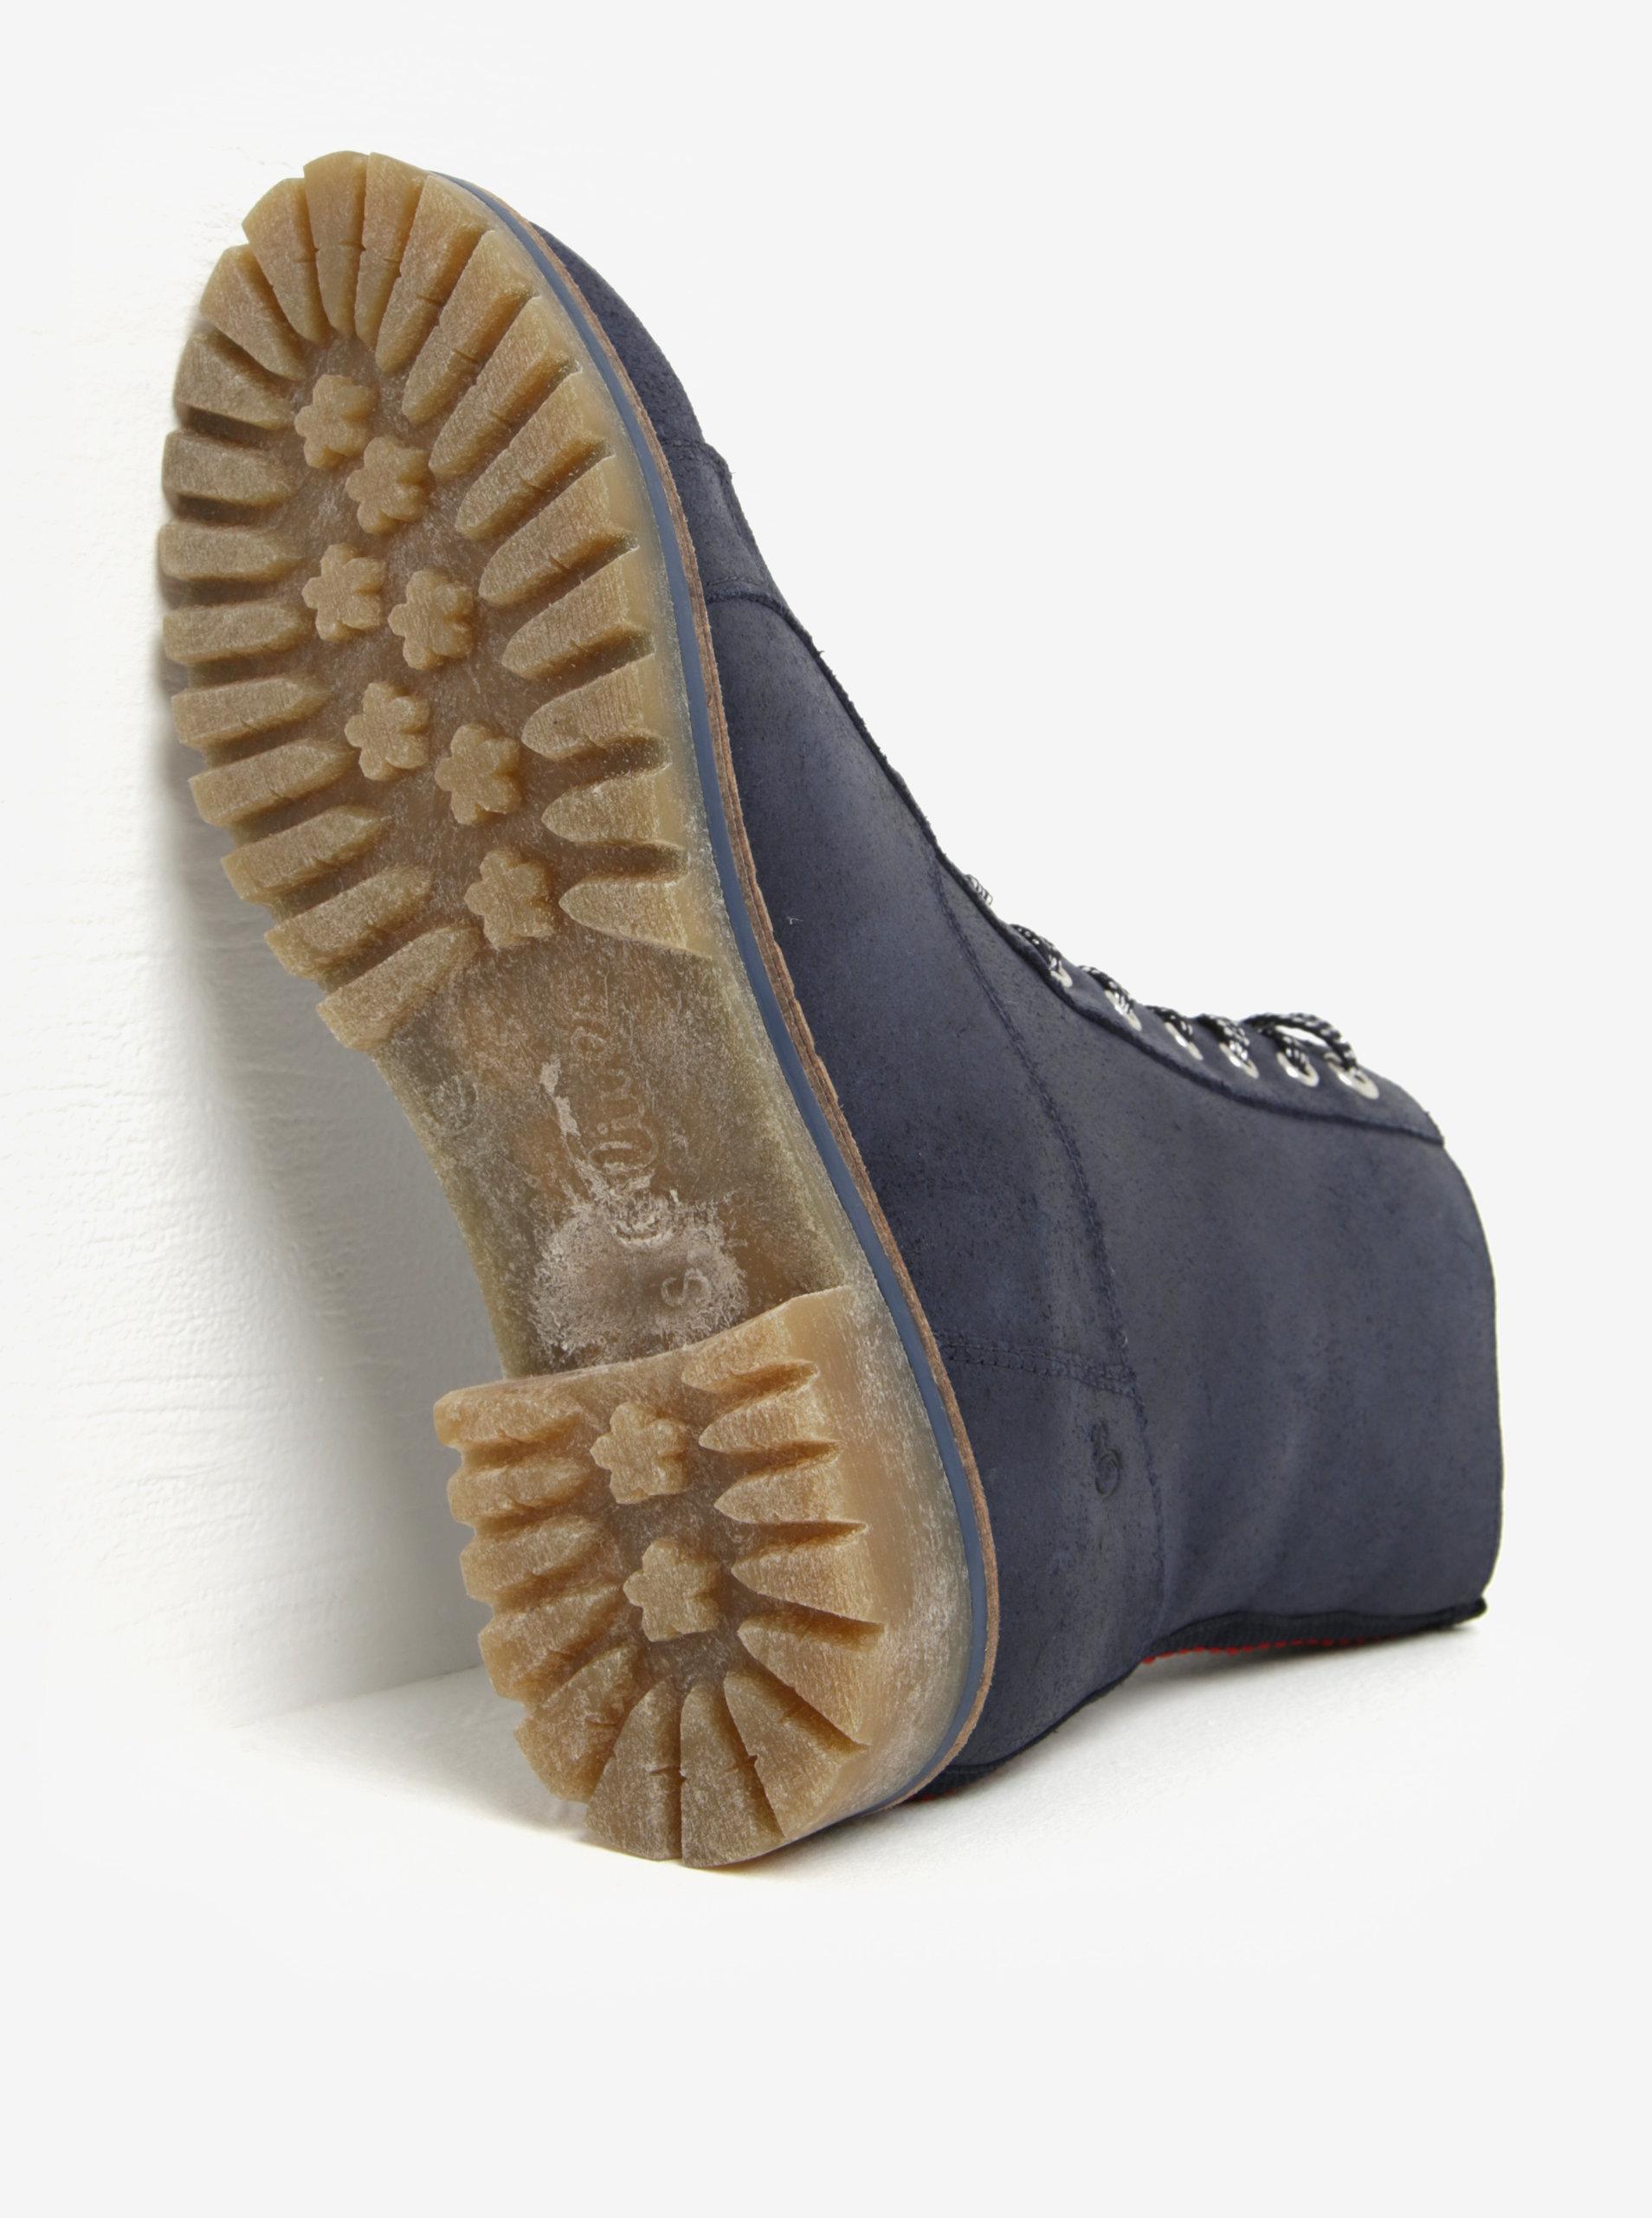 Tmavomodré dámske kožené zimné členkové topánky s.Oliver ... 602207cb33b